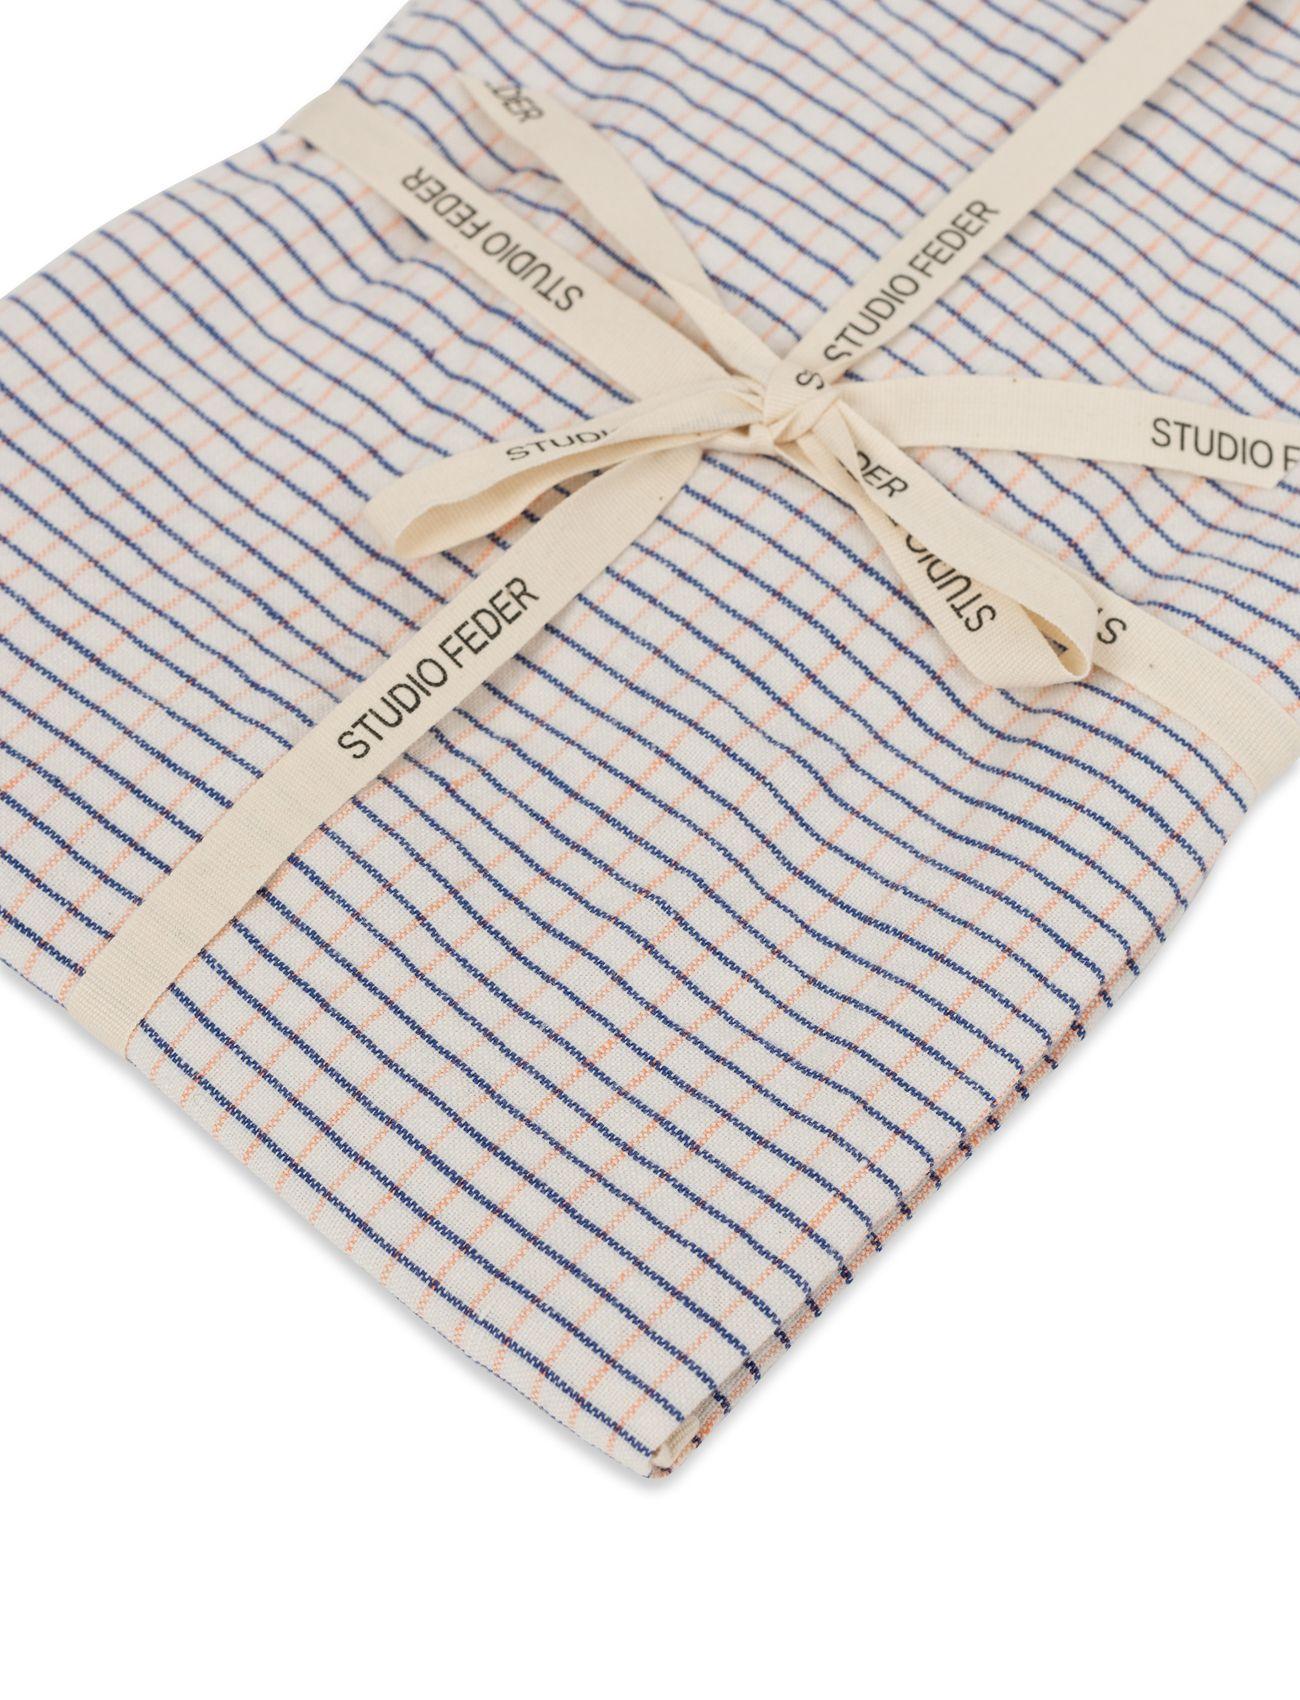 STUDIO FEDER - TEA TOWEL - LAYER CHECK - ręczniki kuchenne - layer check - 1